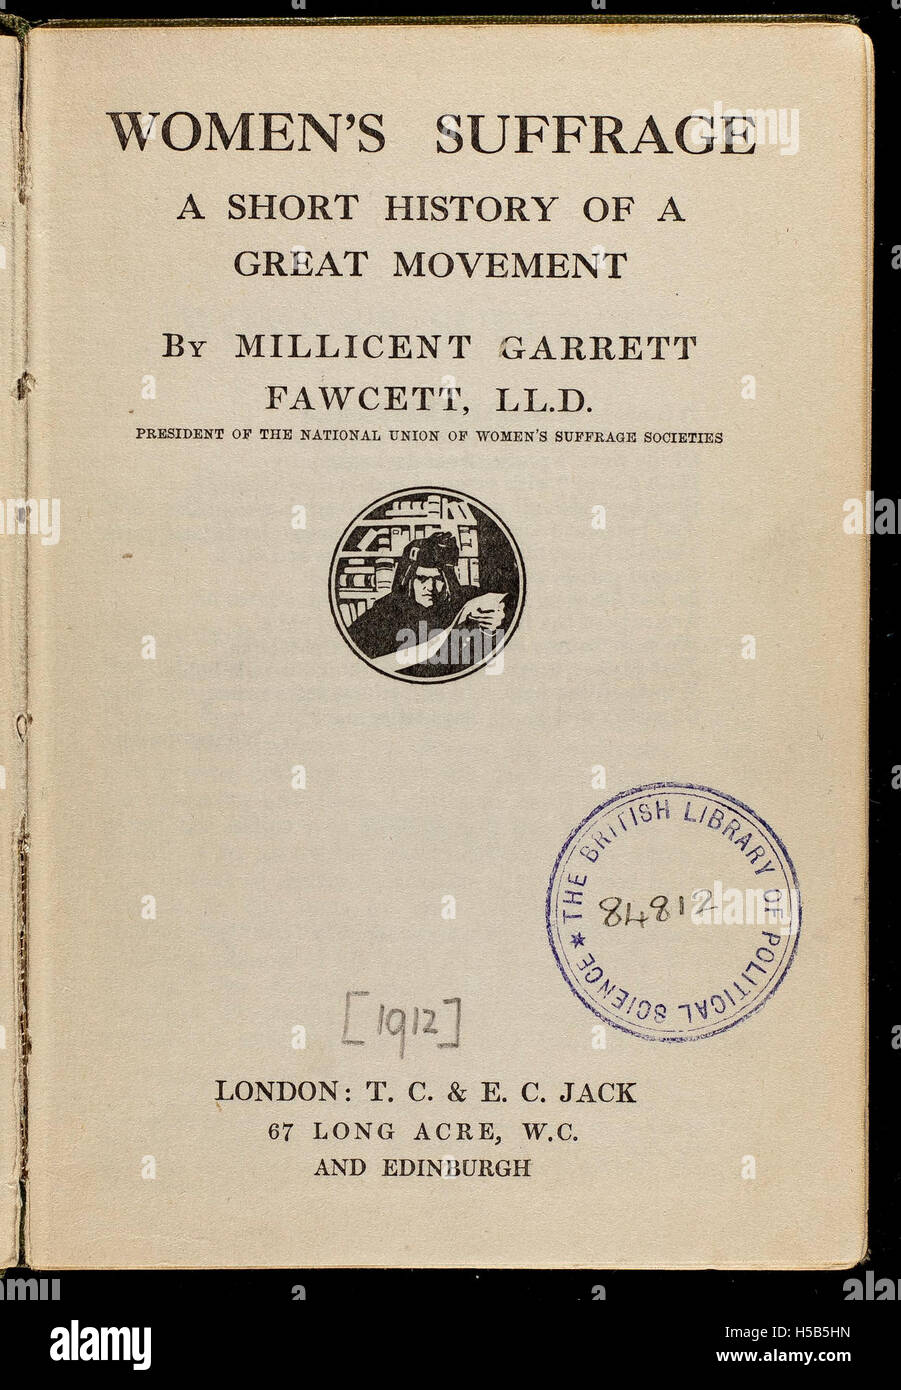 Women's Suffrage by Millicent Garrett Fawcett, 1912. - Stock Image